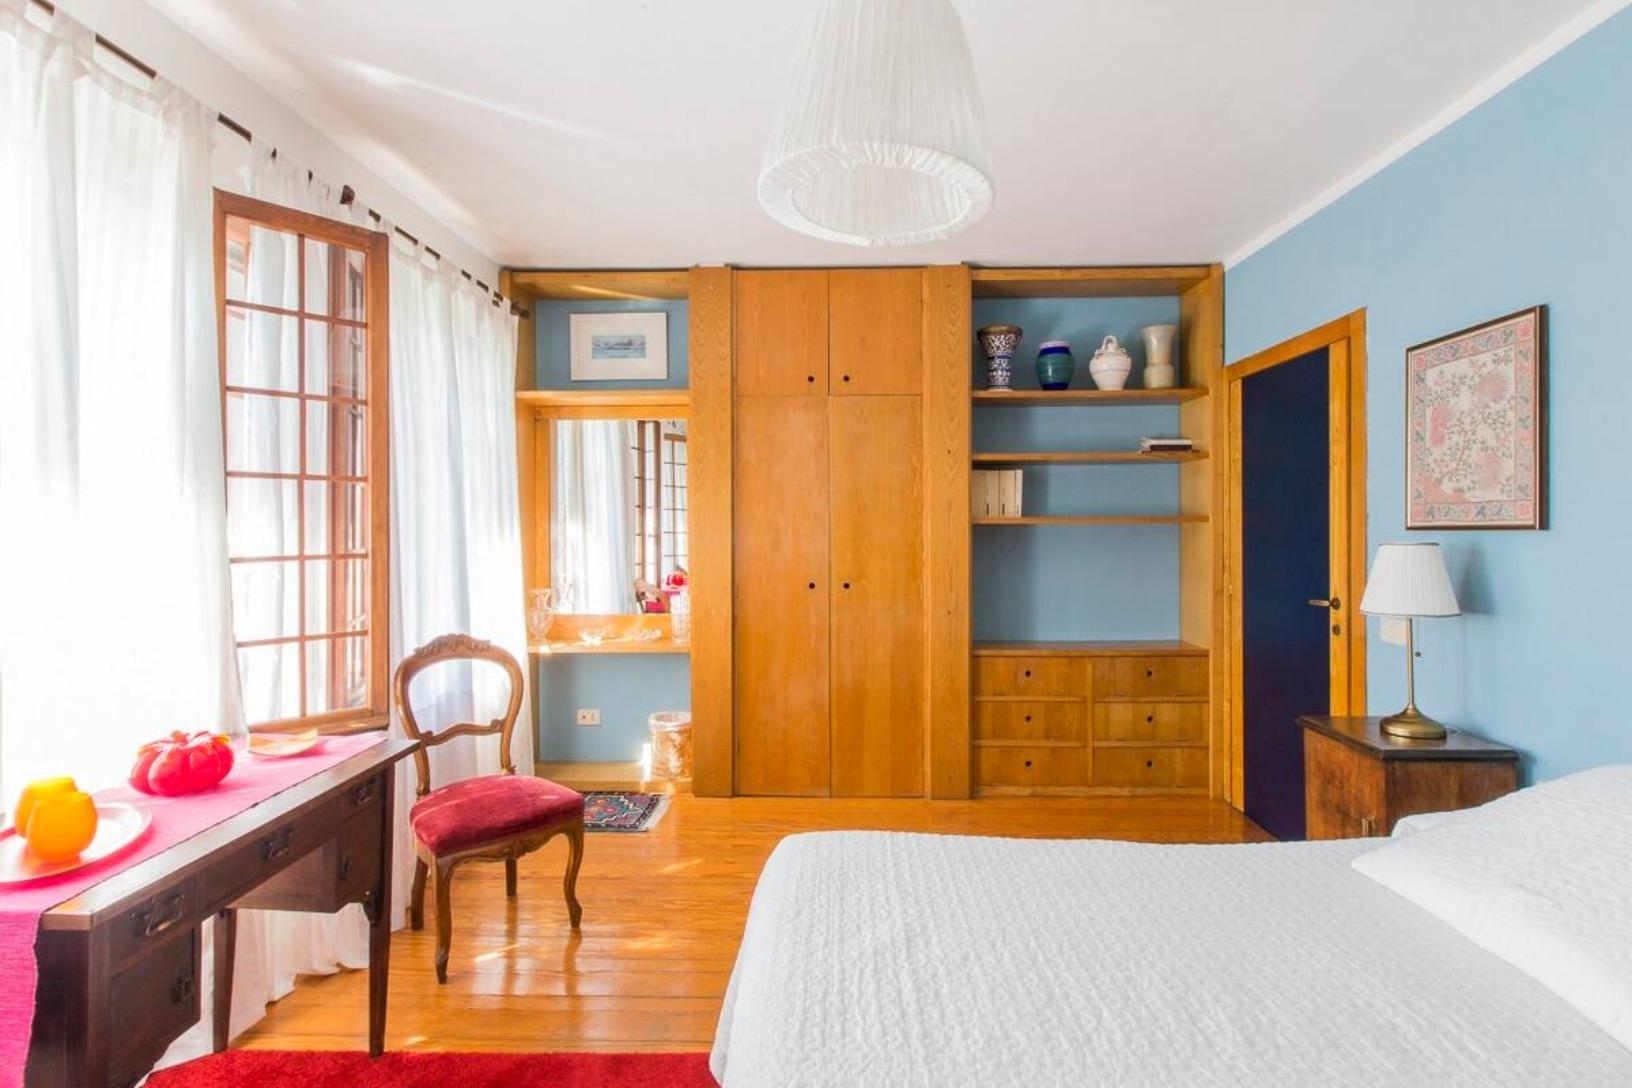 A bedroom with a bed in a room at B&B al Canal Venezia.